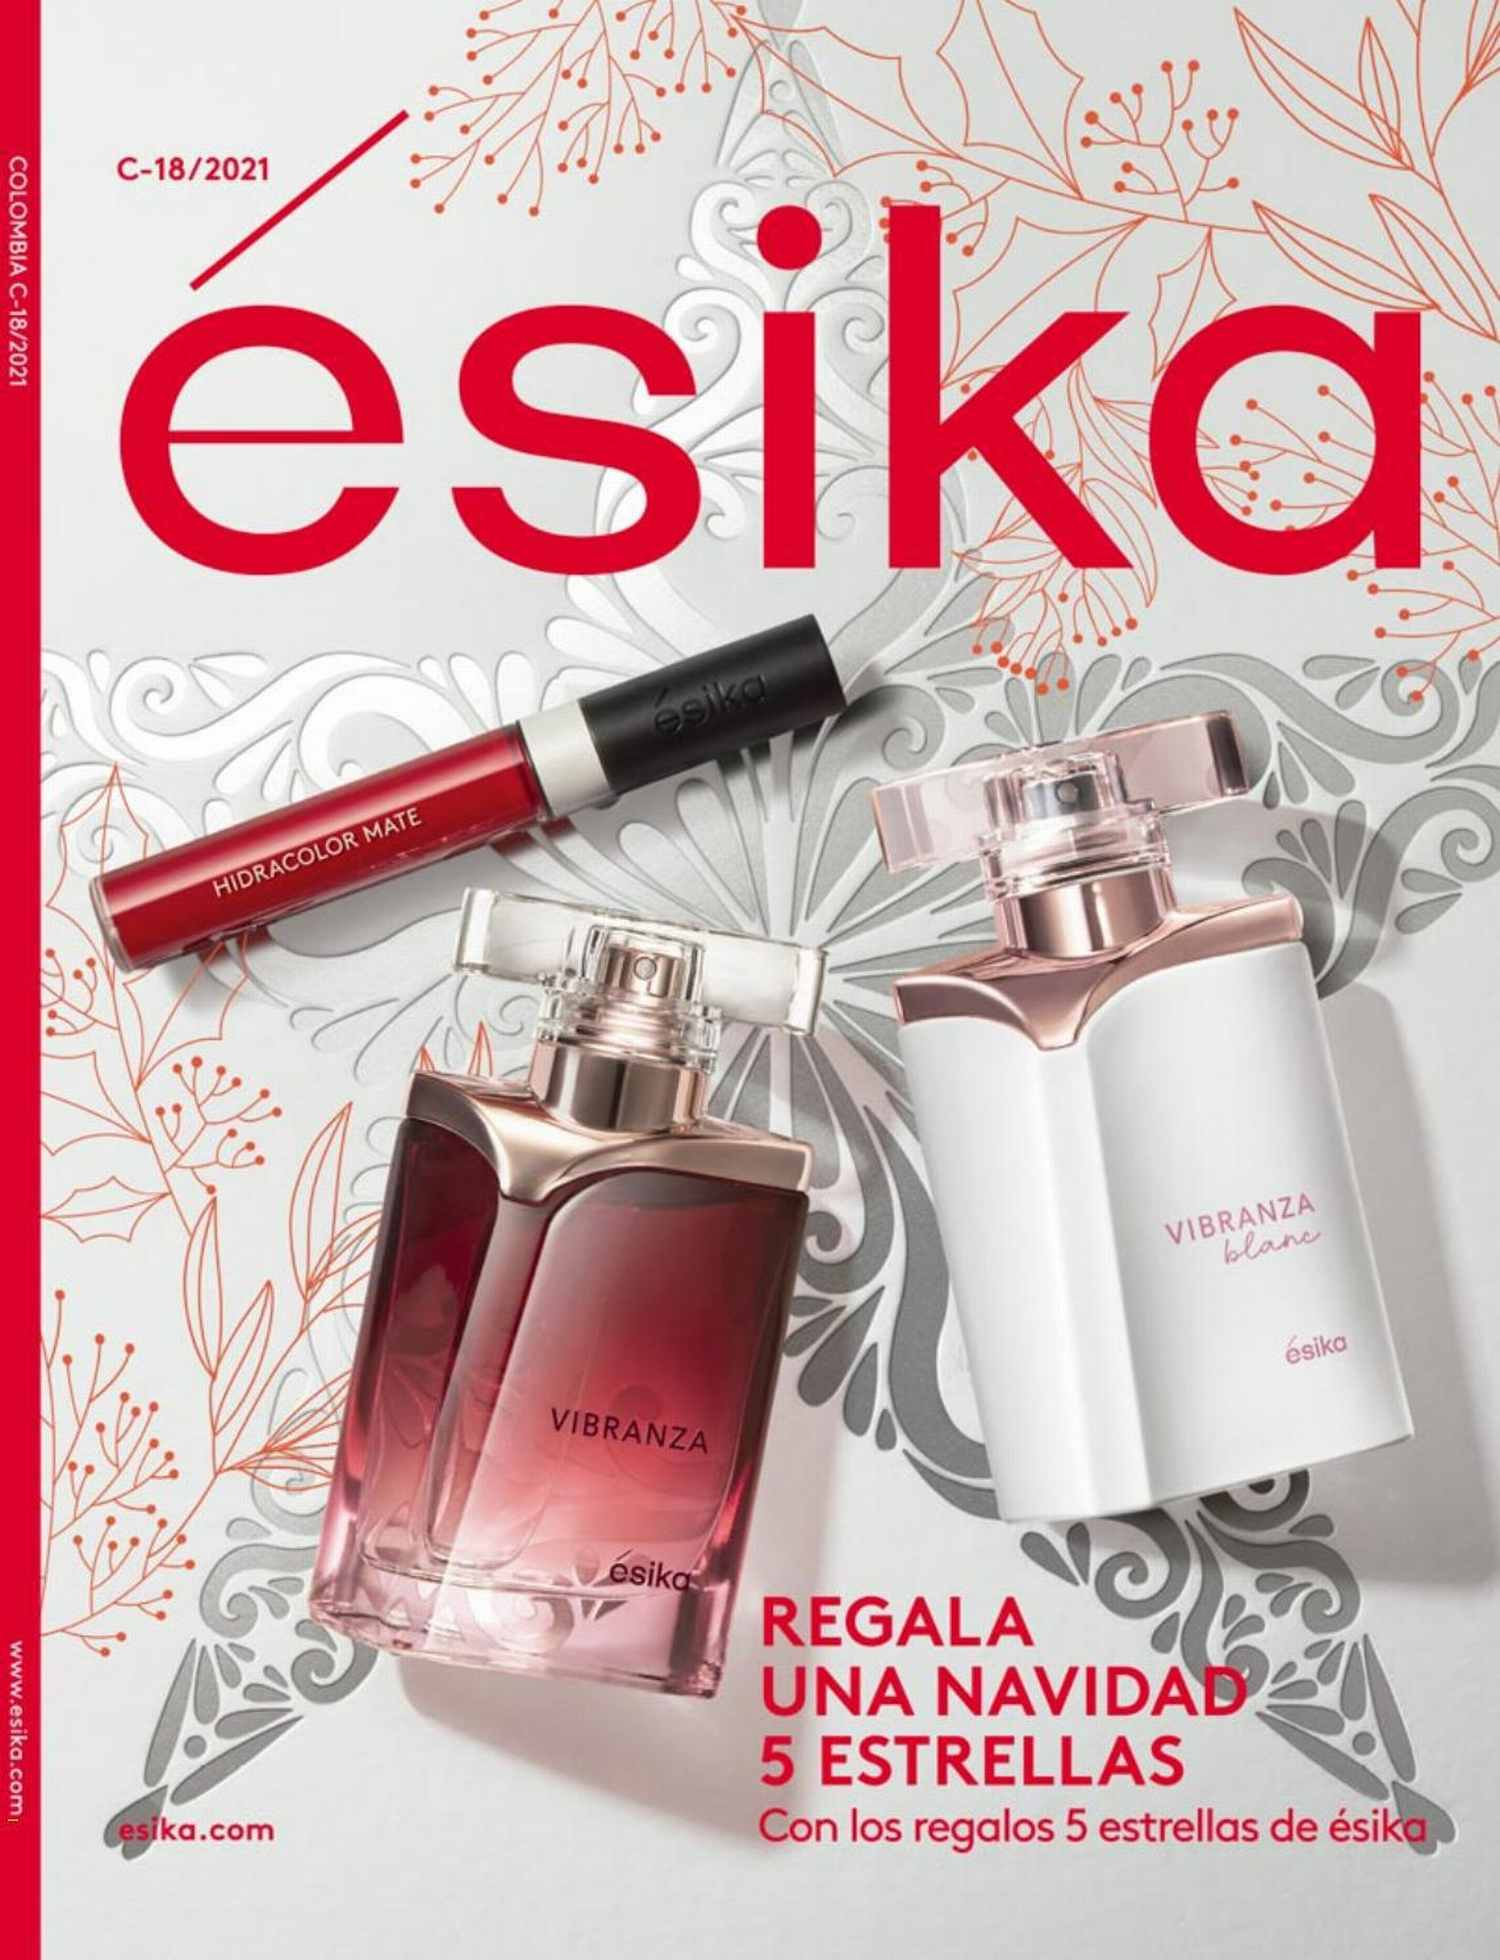 Catálogo Esika Campaña 18 2021 Colombia